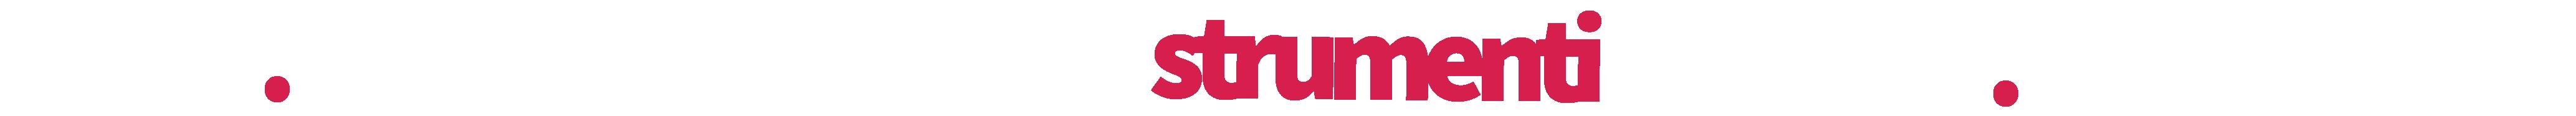 logo-disco-service-musicheria.jpg-sticky